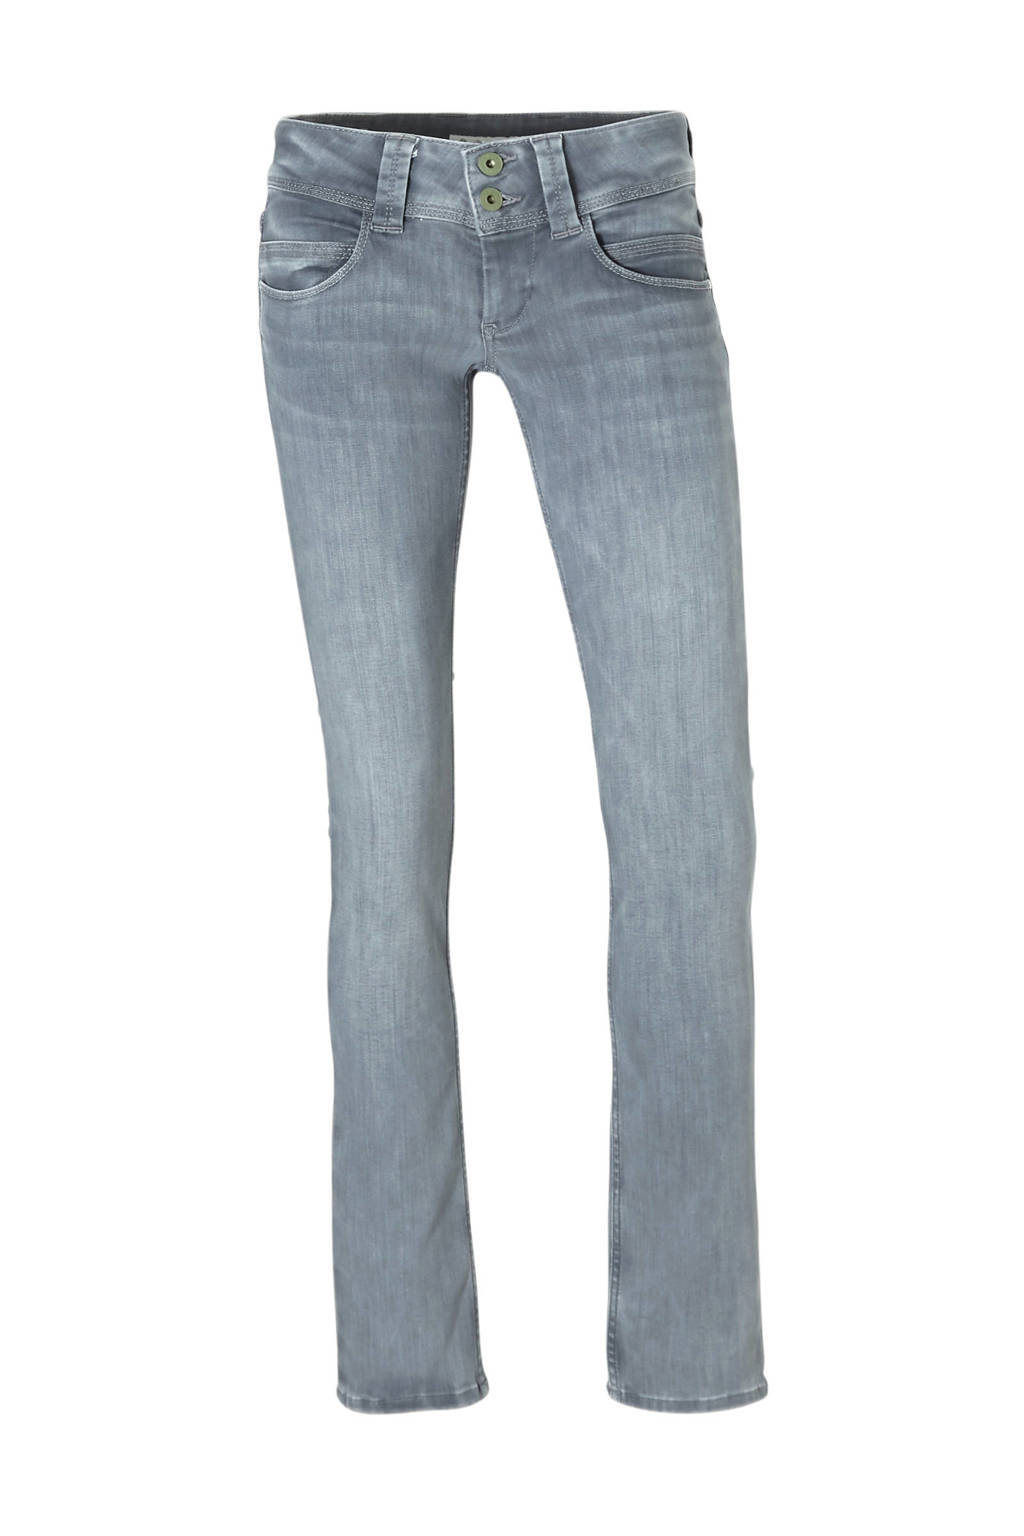 Pepe Jeans Venus straight fit low waist jeans, Grijs